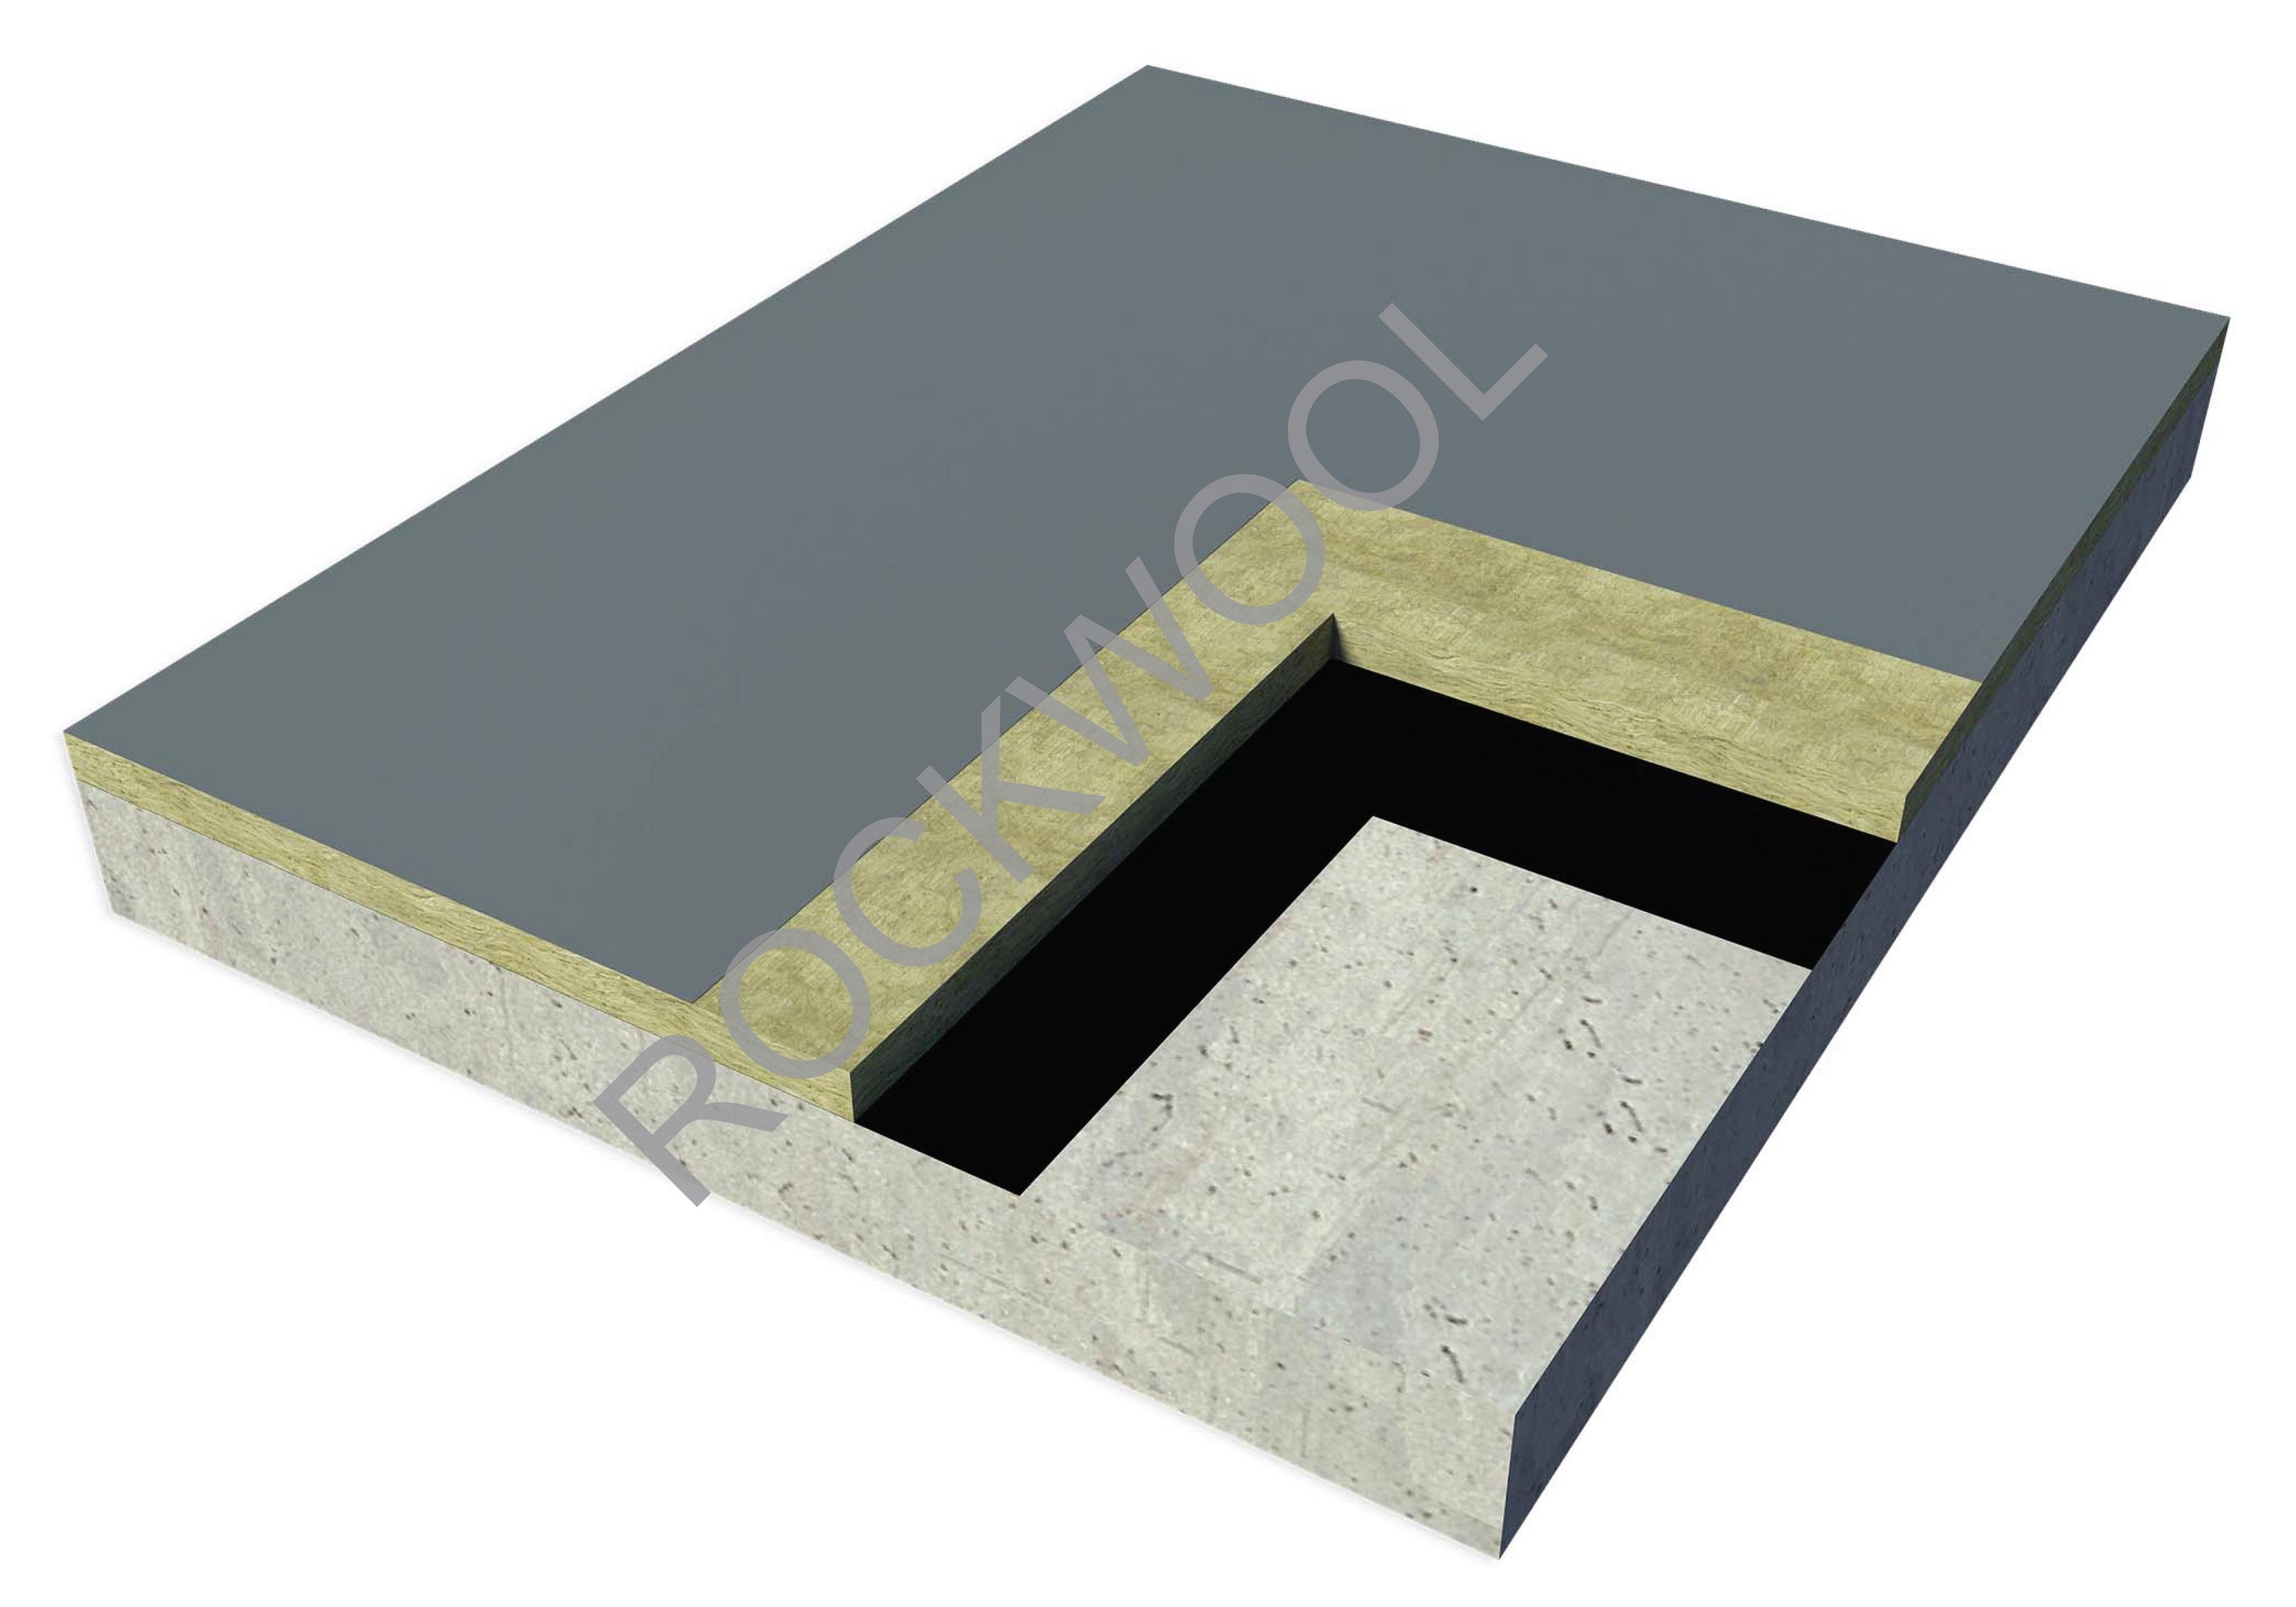 Objet bim rockwool roof concrete deck roof hardrock 80 - Telechargement open office 3 2 gratuit ...